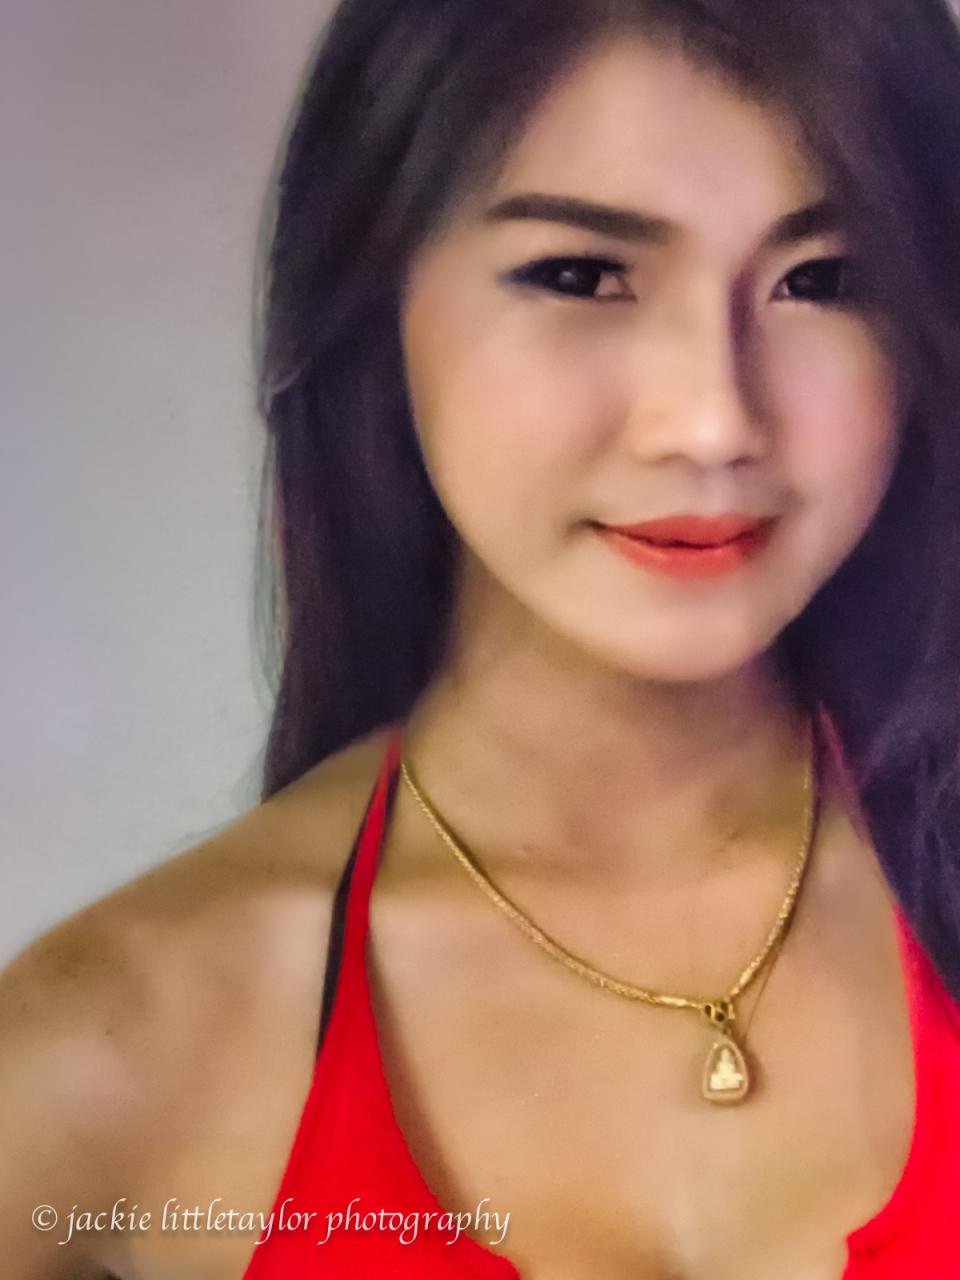 gogo dancer red top impression #2